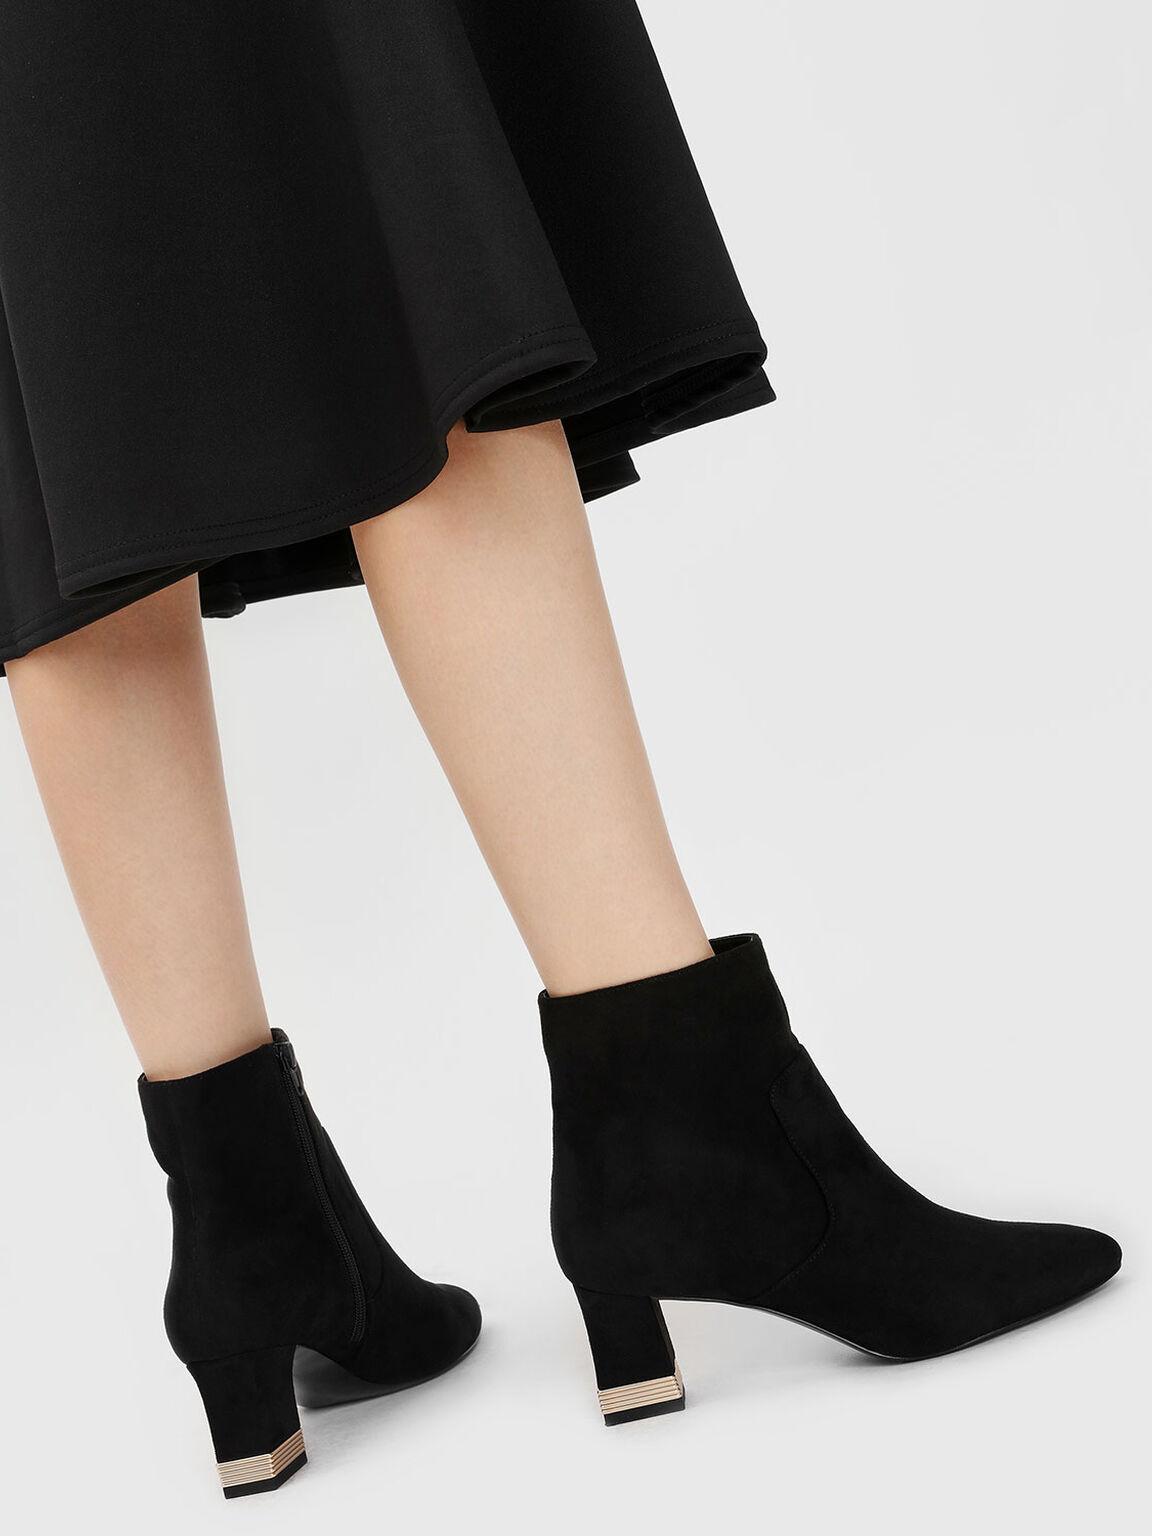 Metallic Accent Heel Boots, Black, hi-res